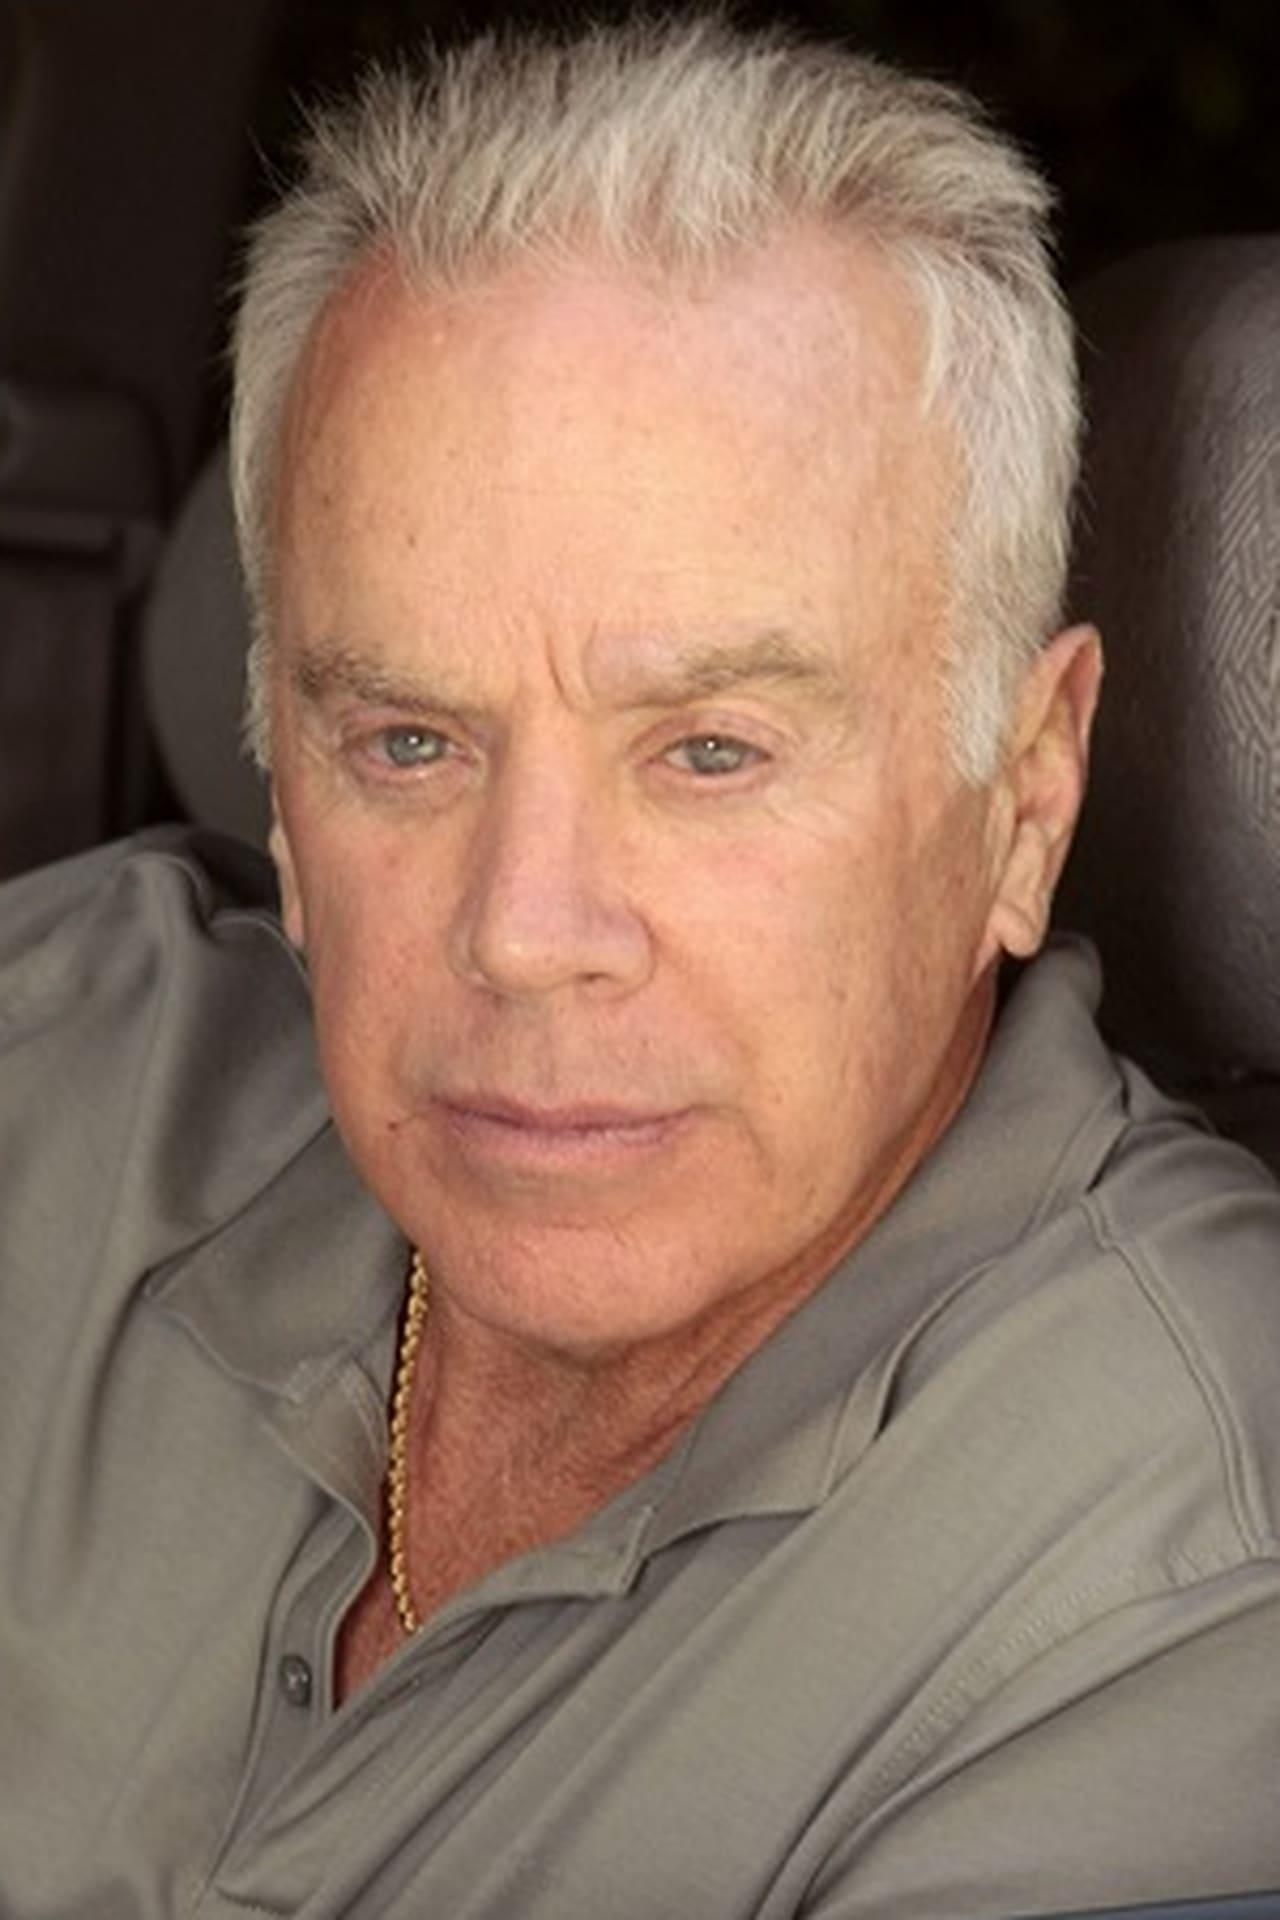 Joseph Carberry